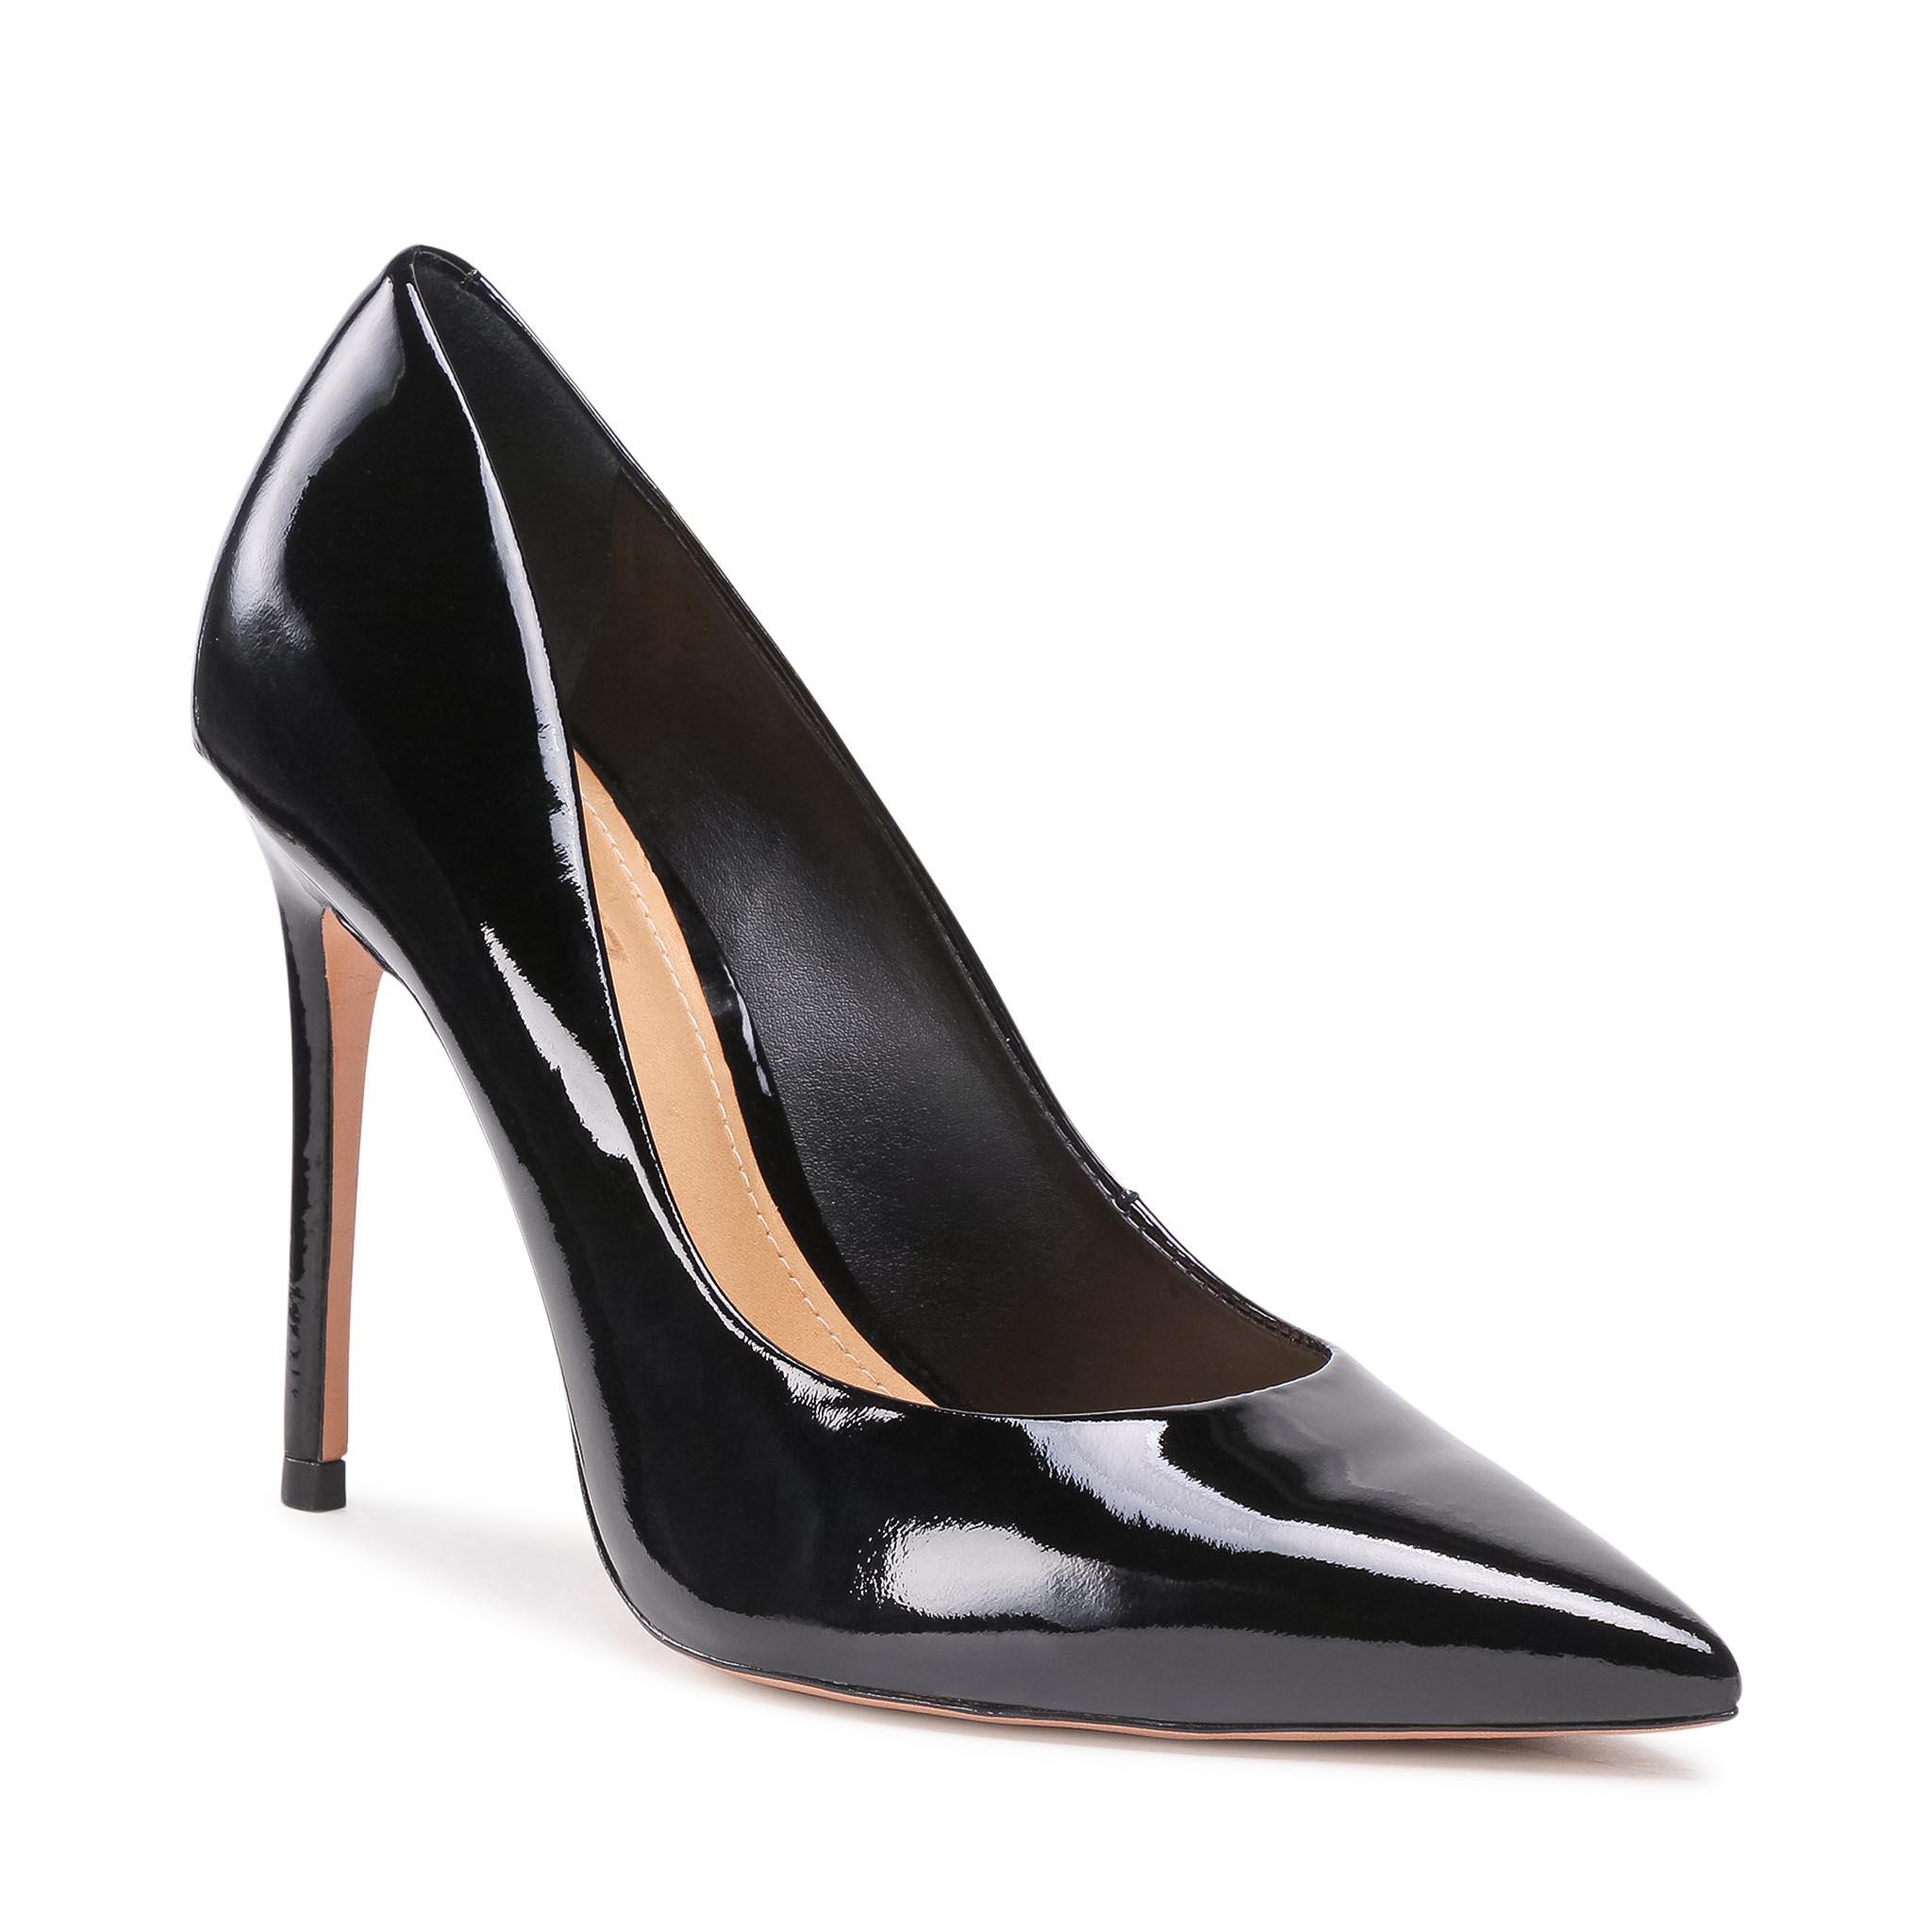 Scarpe stiletto SCHUTZ - S 02091 0001 0722 U Black